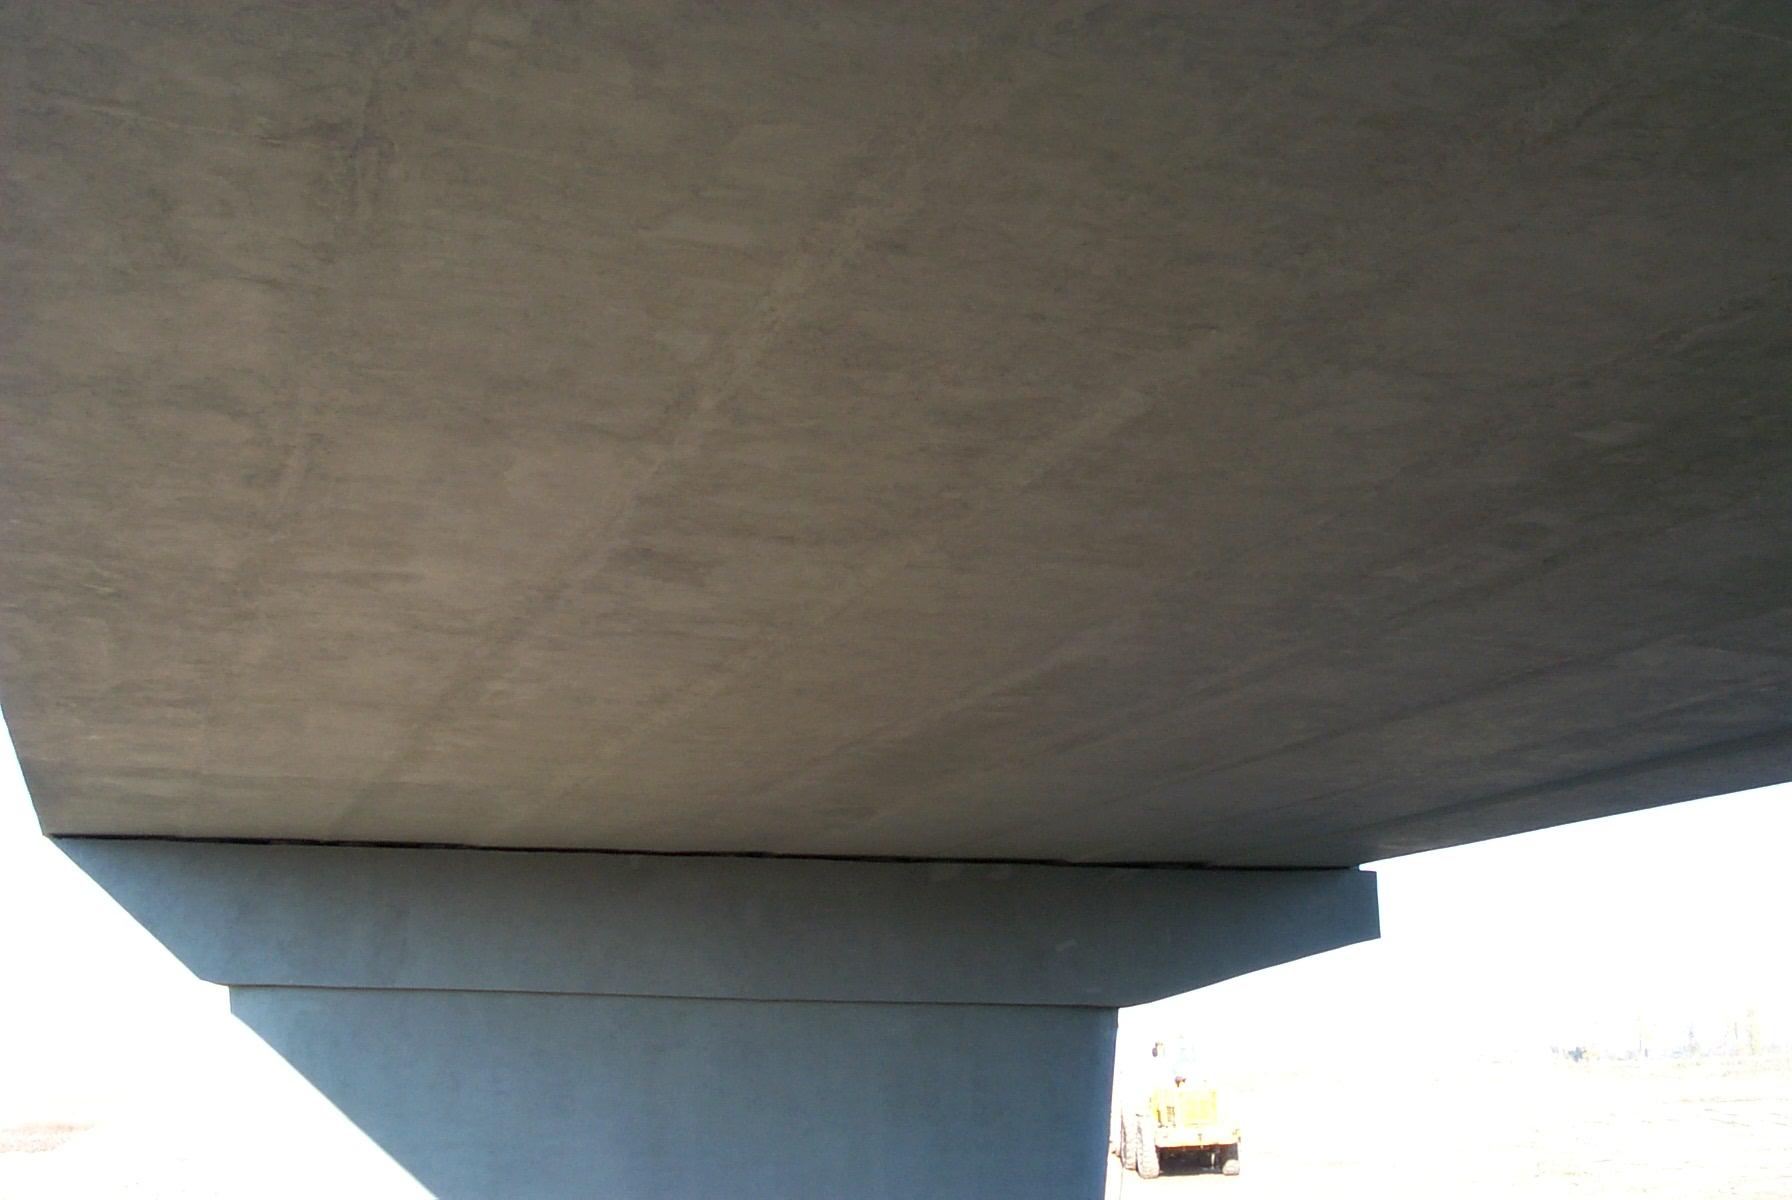 Reparatii pod (DN2), Km. 33 - 028, peste raul Calnistea MAPEI - Poza 18